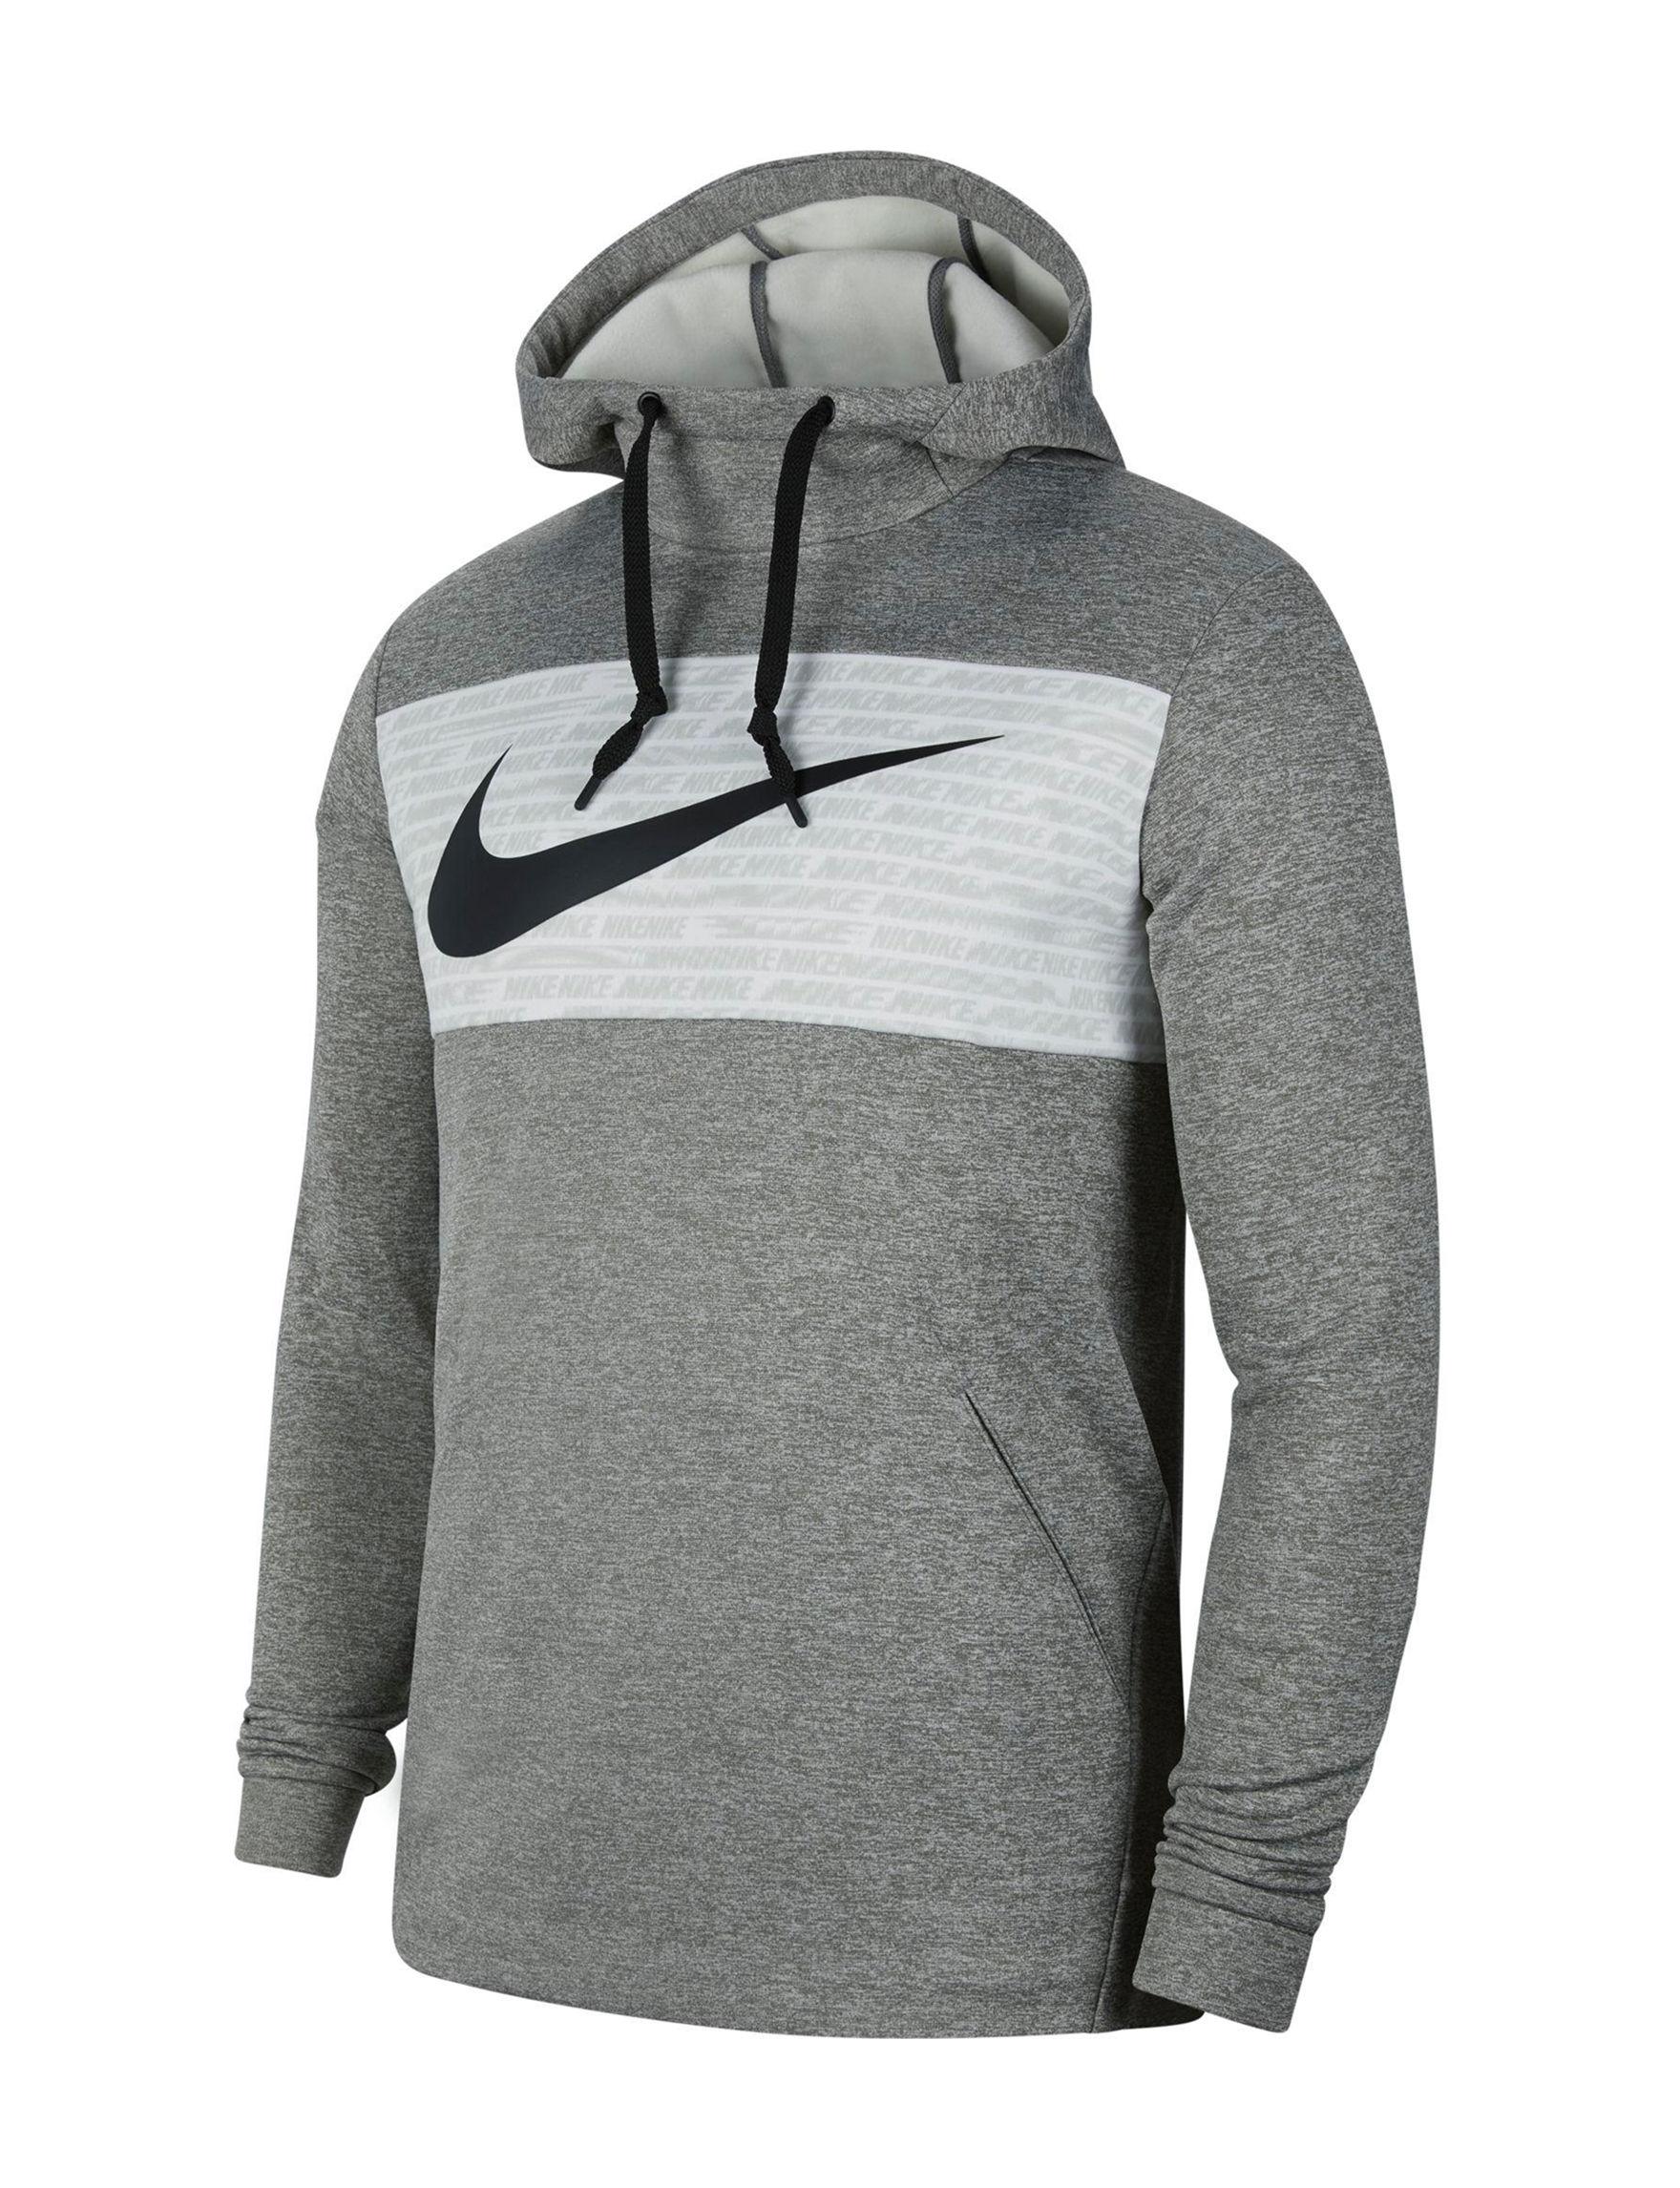 Nike Grey / Black Pull-overs